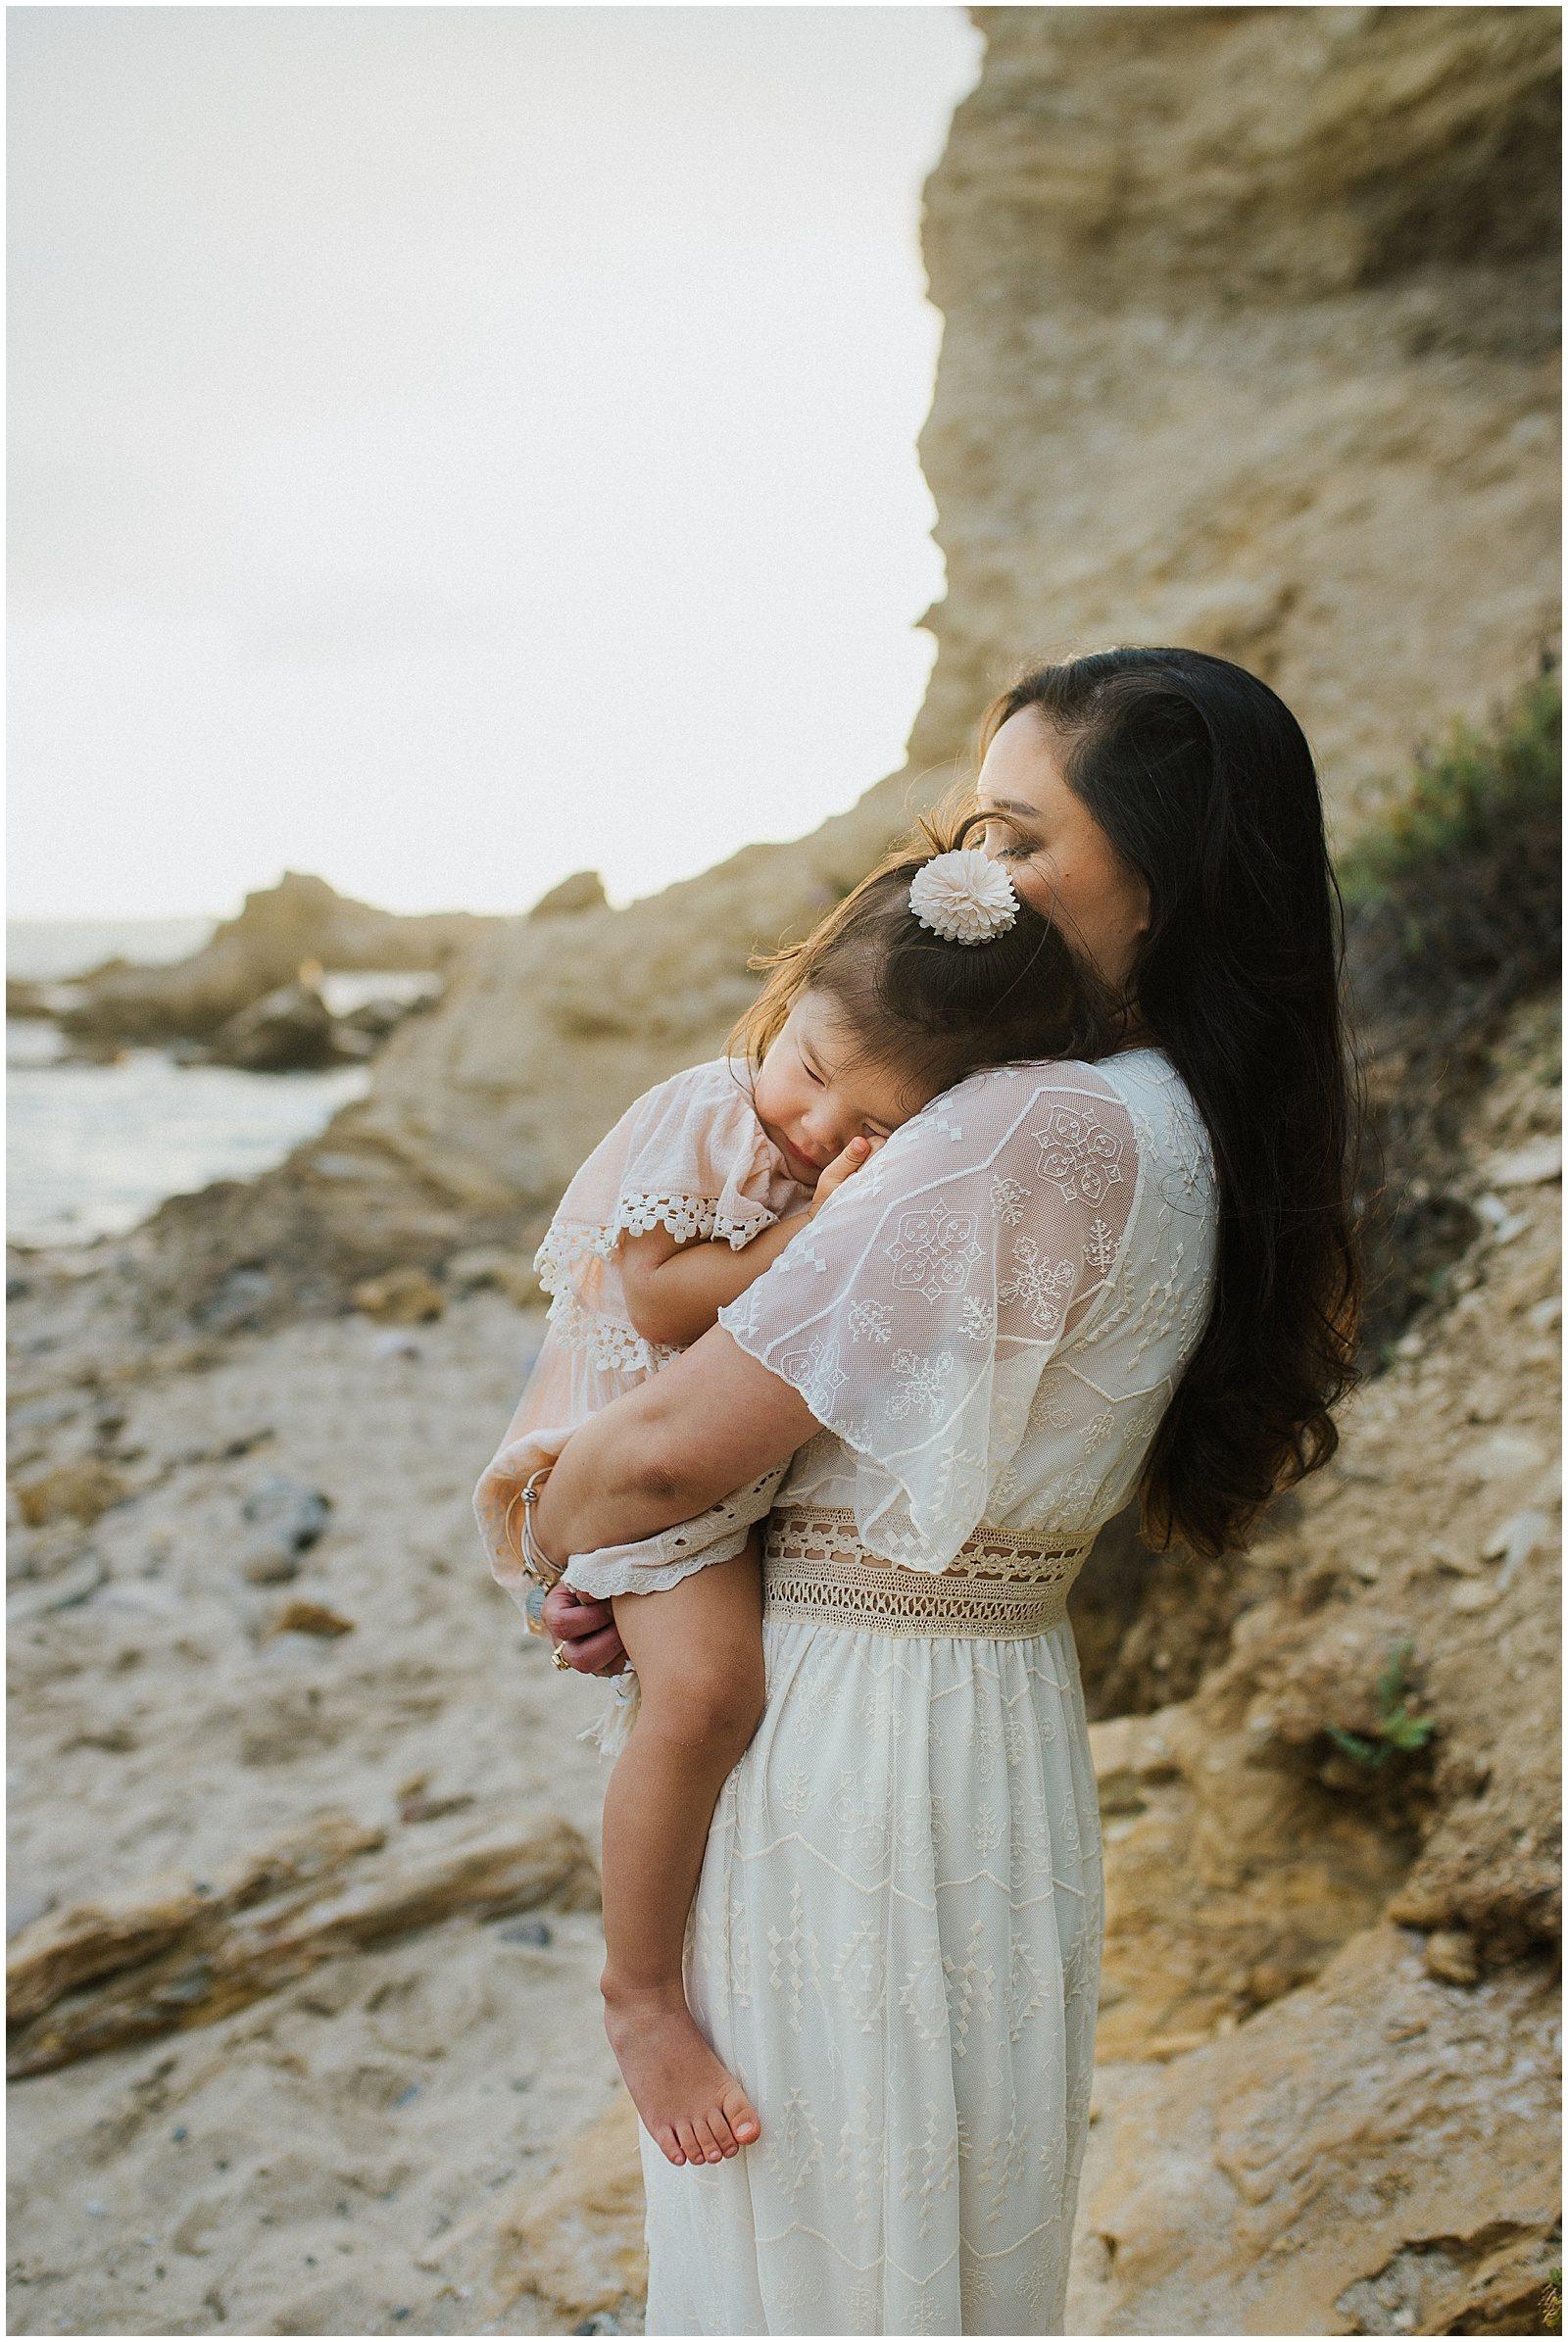 Orange County Family Photographer Sonja Hammad Photography 0383